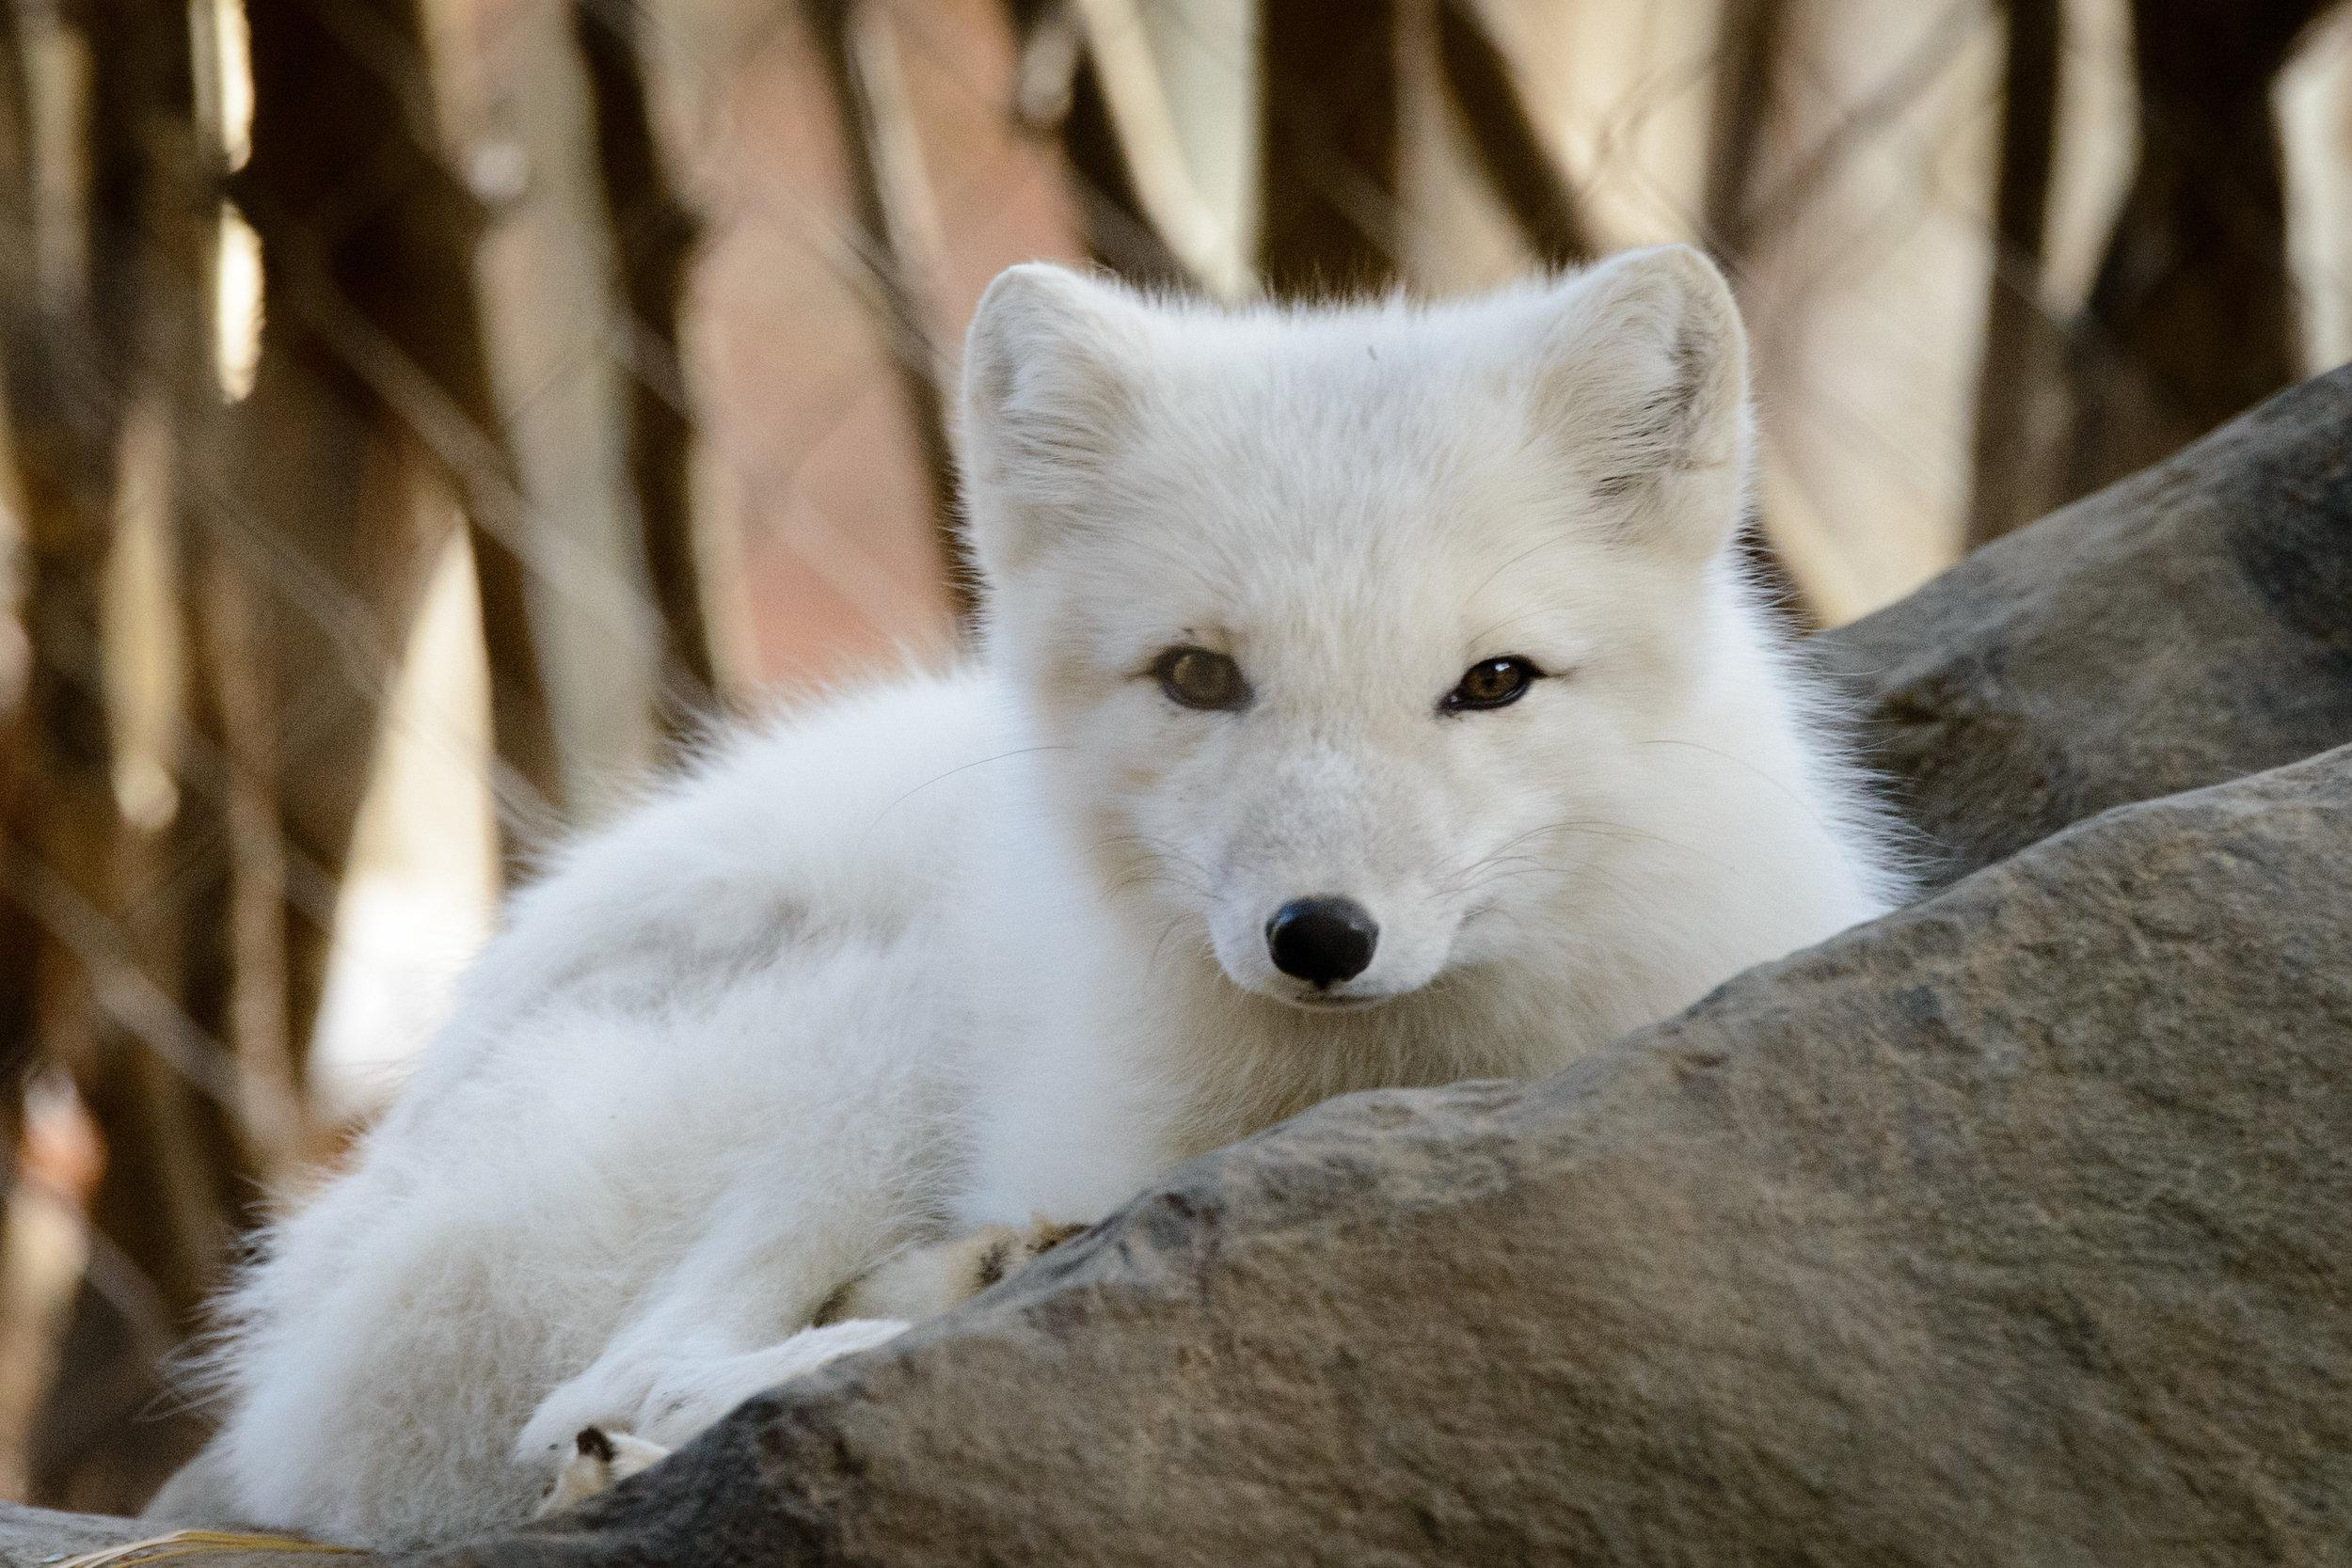 Arctic Fox.  2012. Eric Kilby on  Flickr.  Under  Creative Commons 2.0